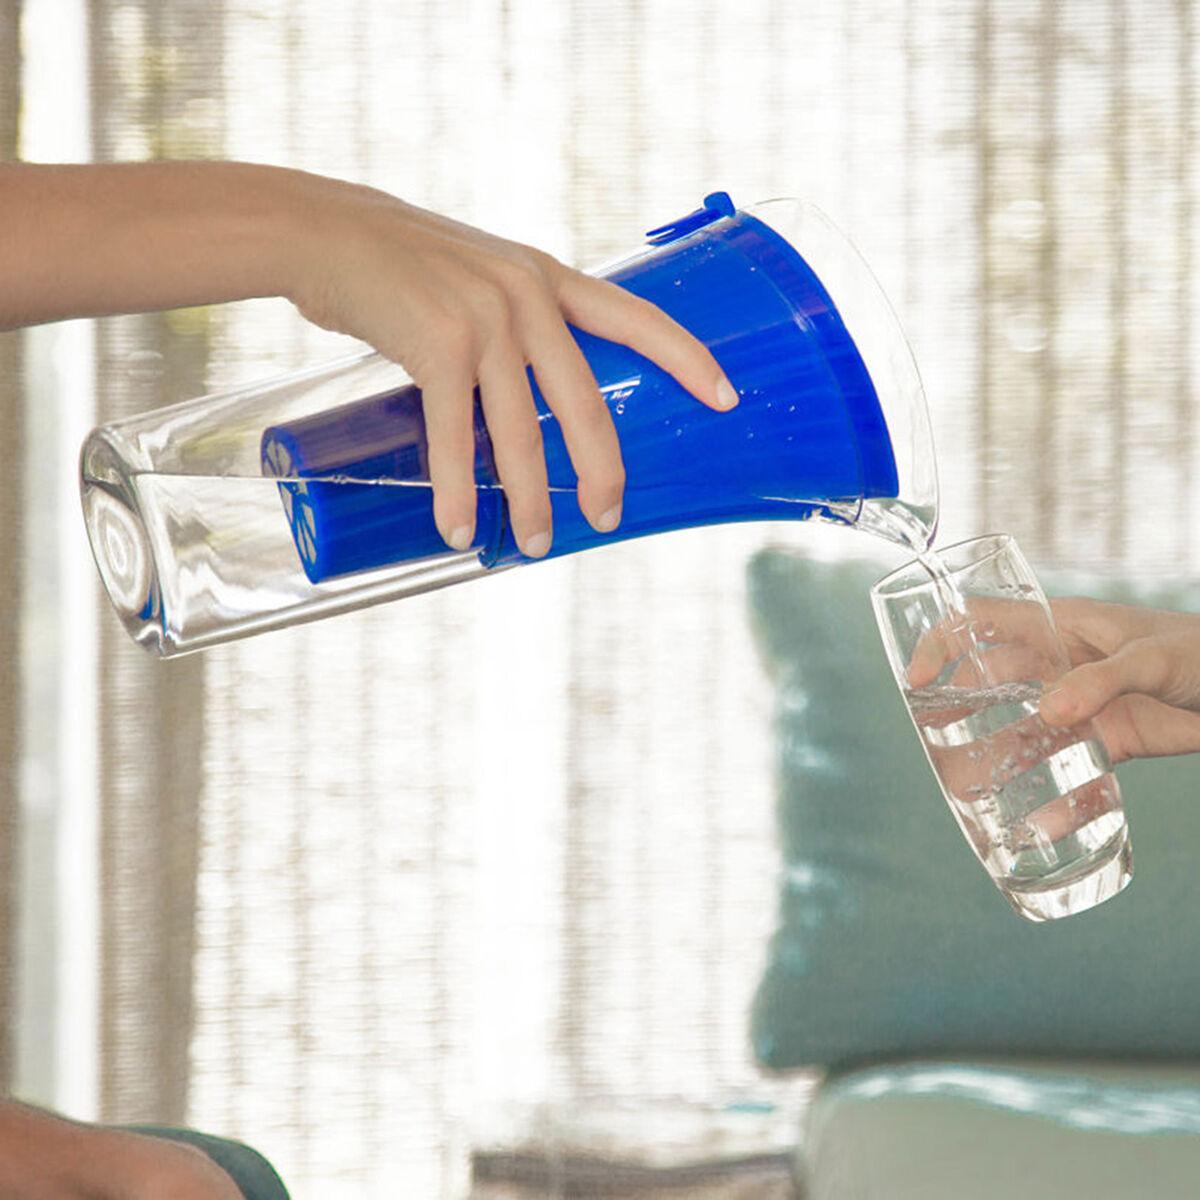 Jarro Purificador de Agua + Botella Benjamina Dvigi Azul